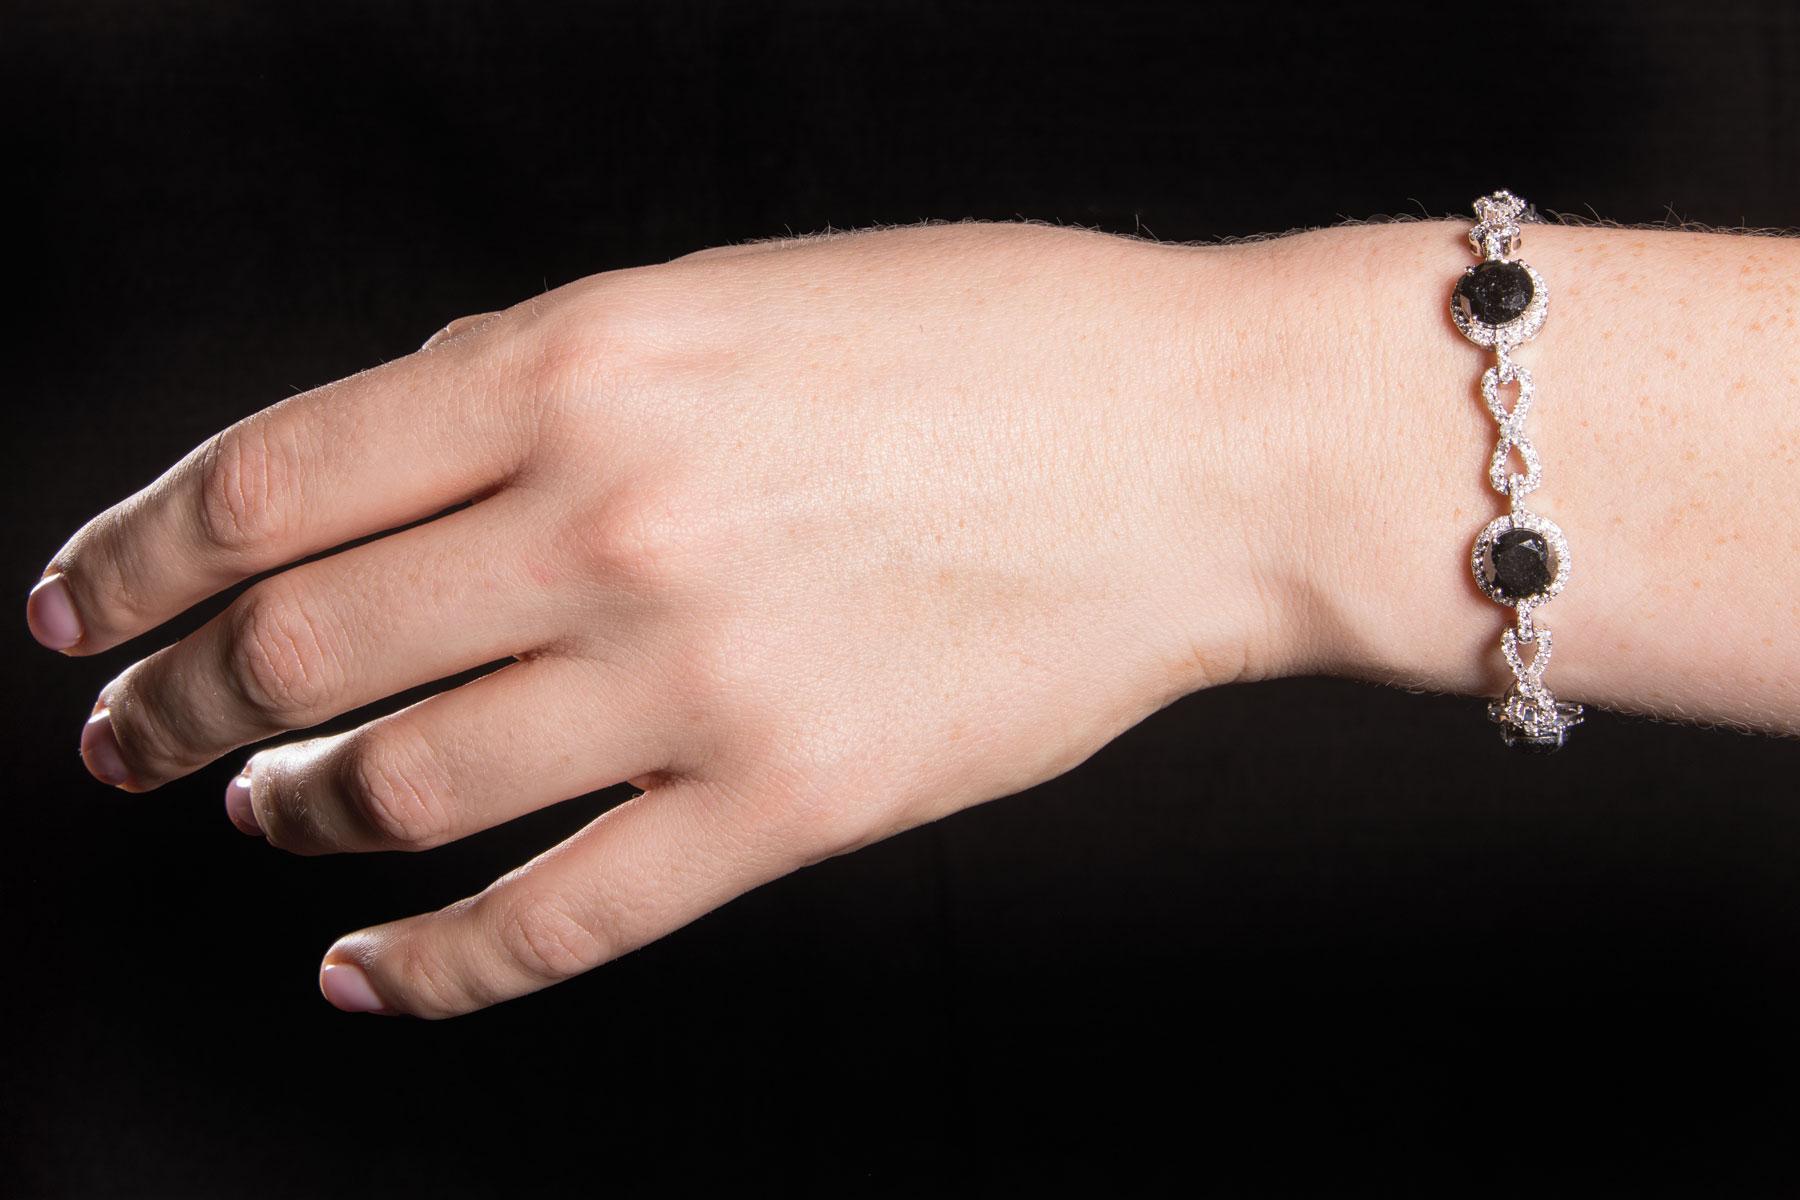 Lot 619 - 14 kt. White Gold, Black Diamond and Diamond Bracelet , 6 round brilliant cut black diamonds, 7.8-